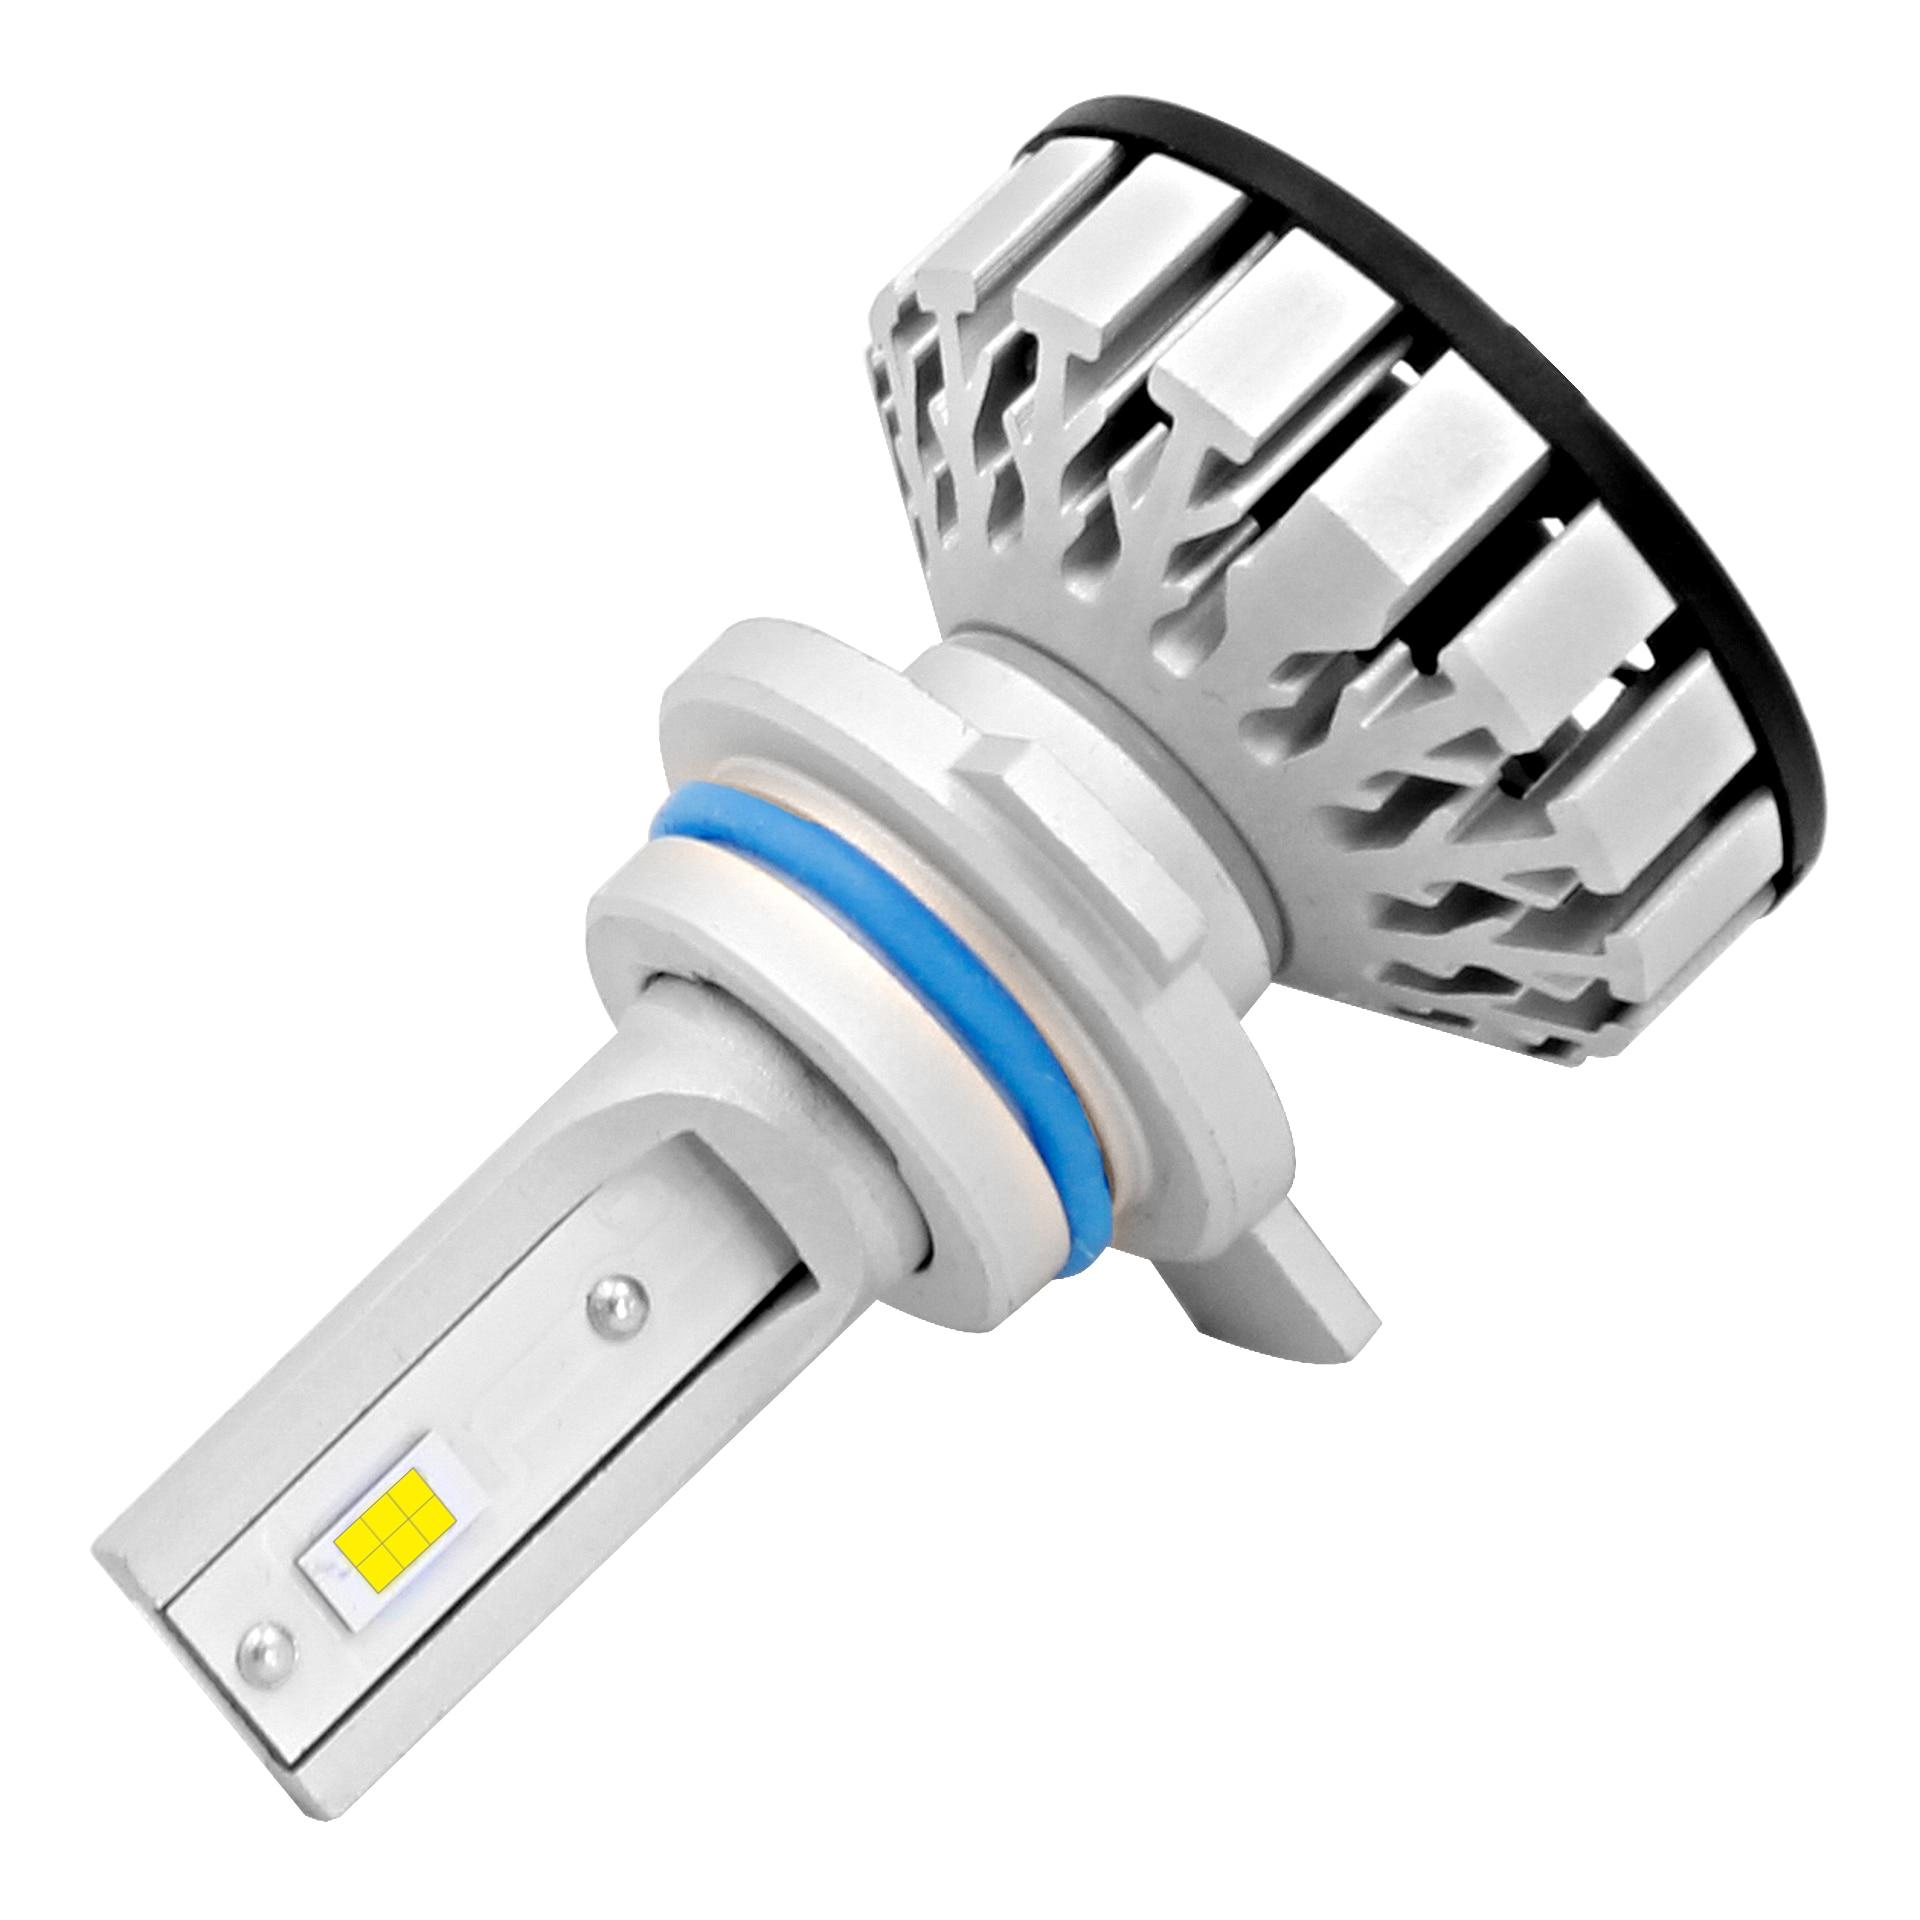 Car LED Headlight Bulbs R8 H1 H3 H4 H7 H11 9005 9006 9012 High Light Efficiency Waterproof 6000K White Color Car Light 12V